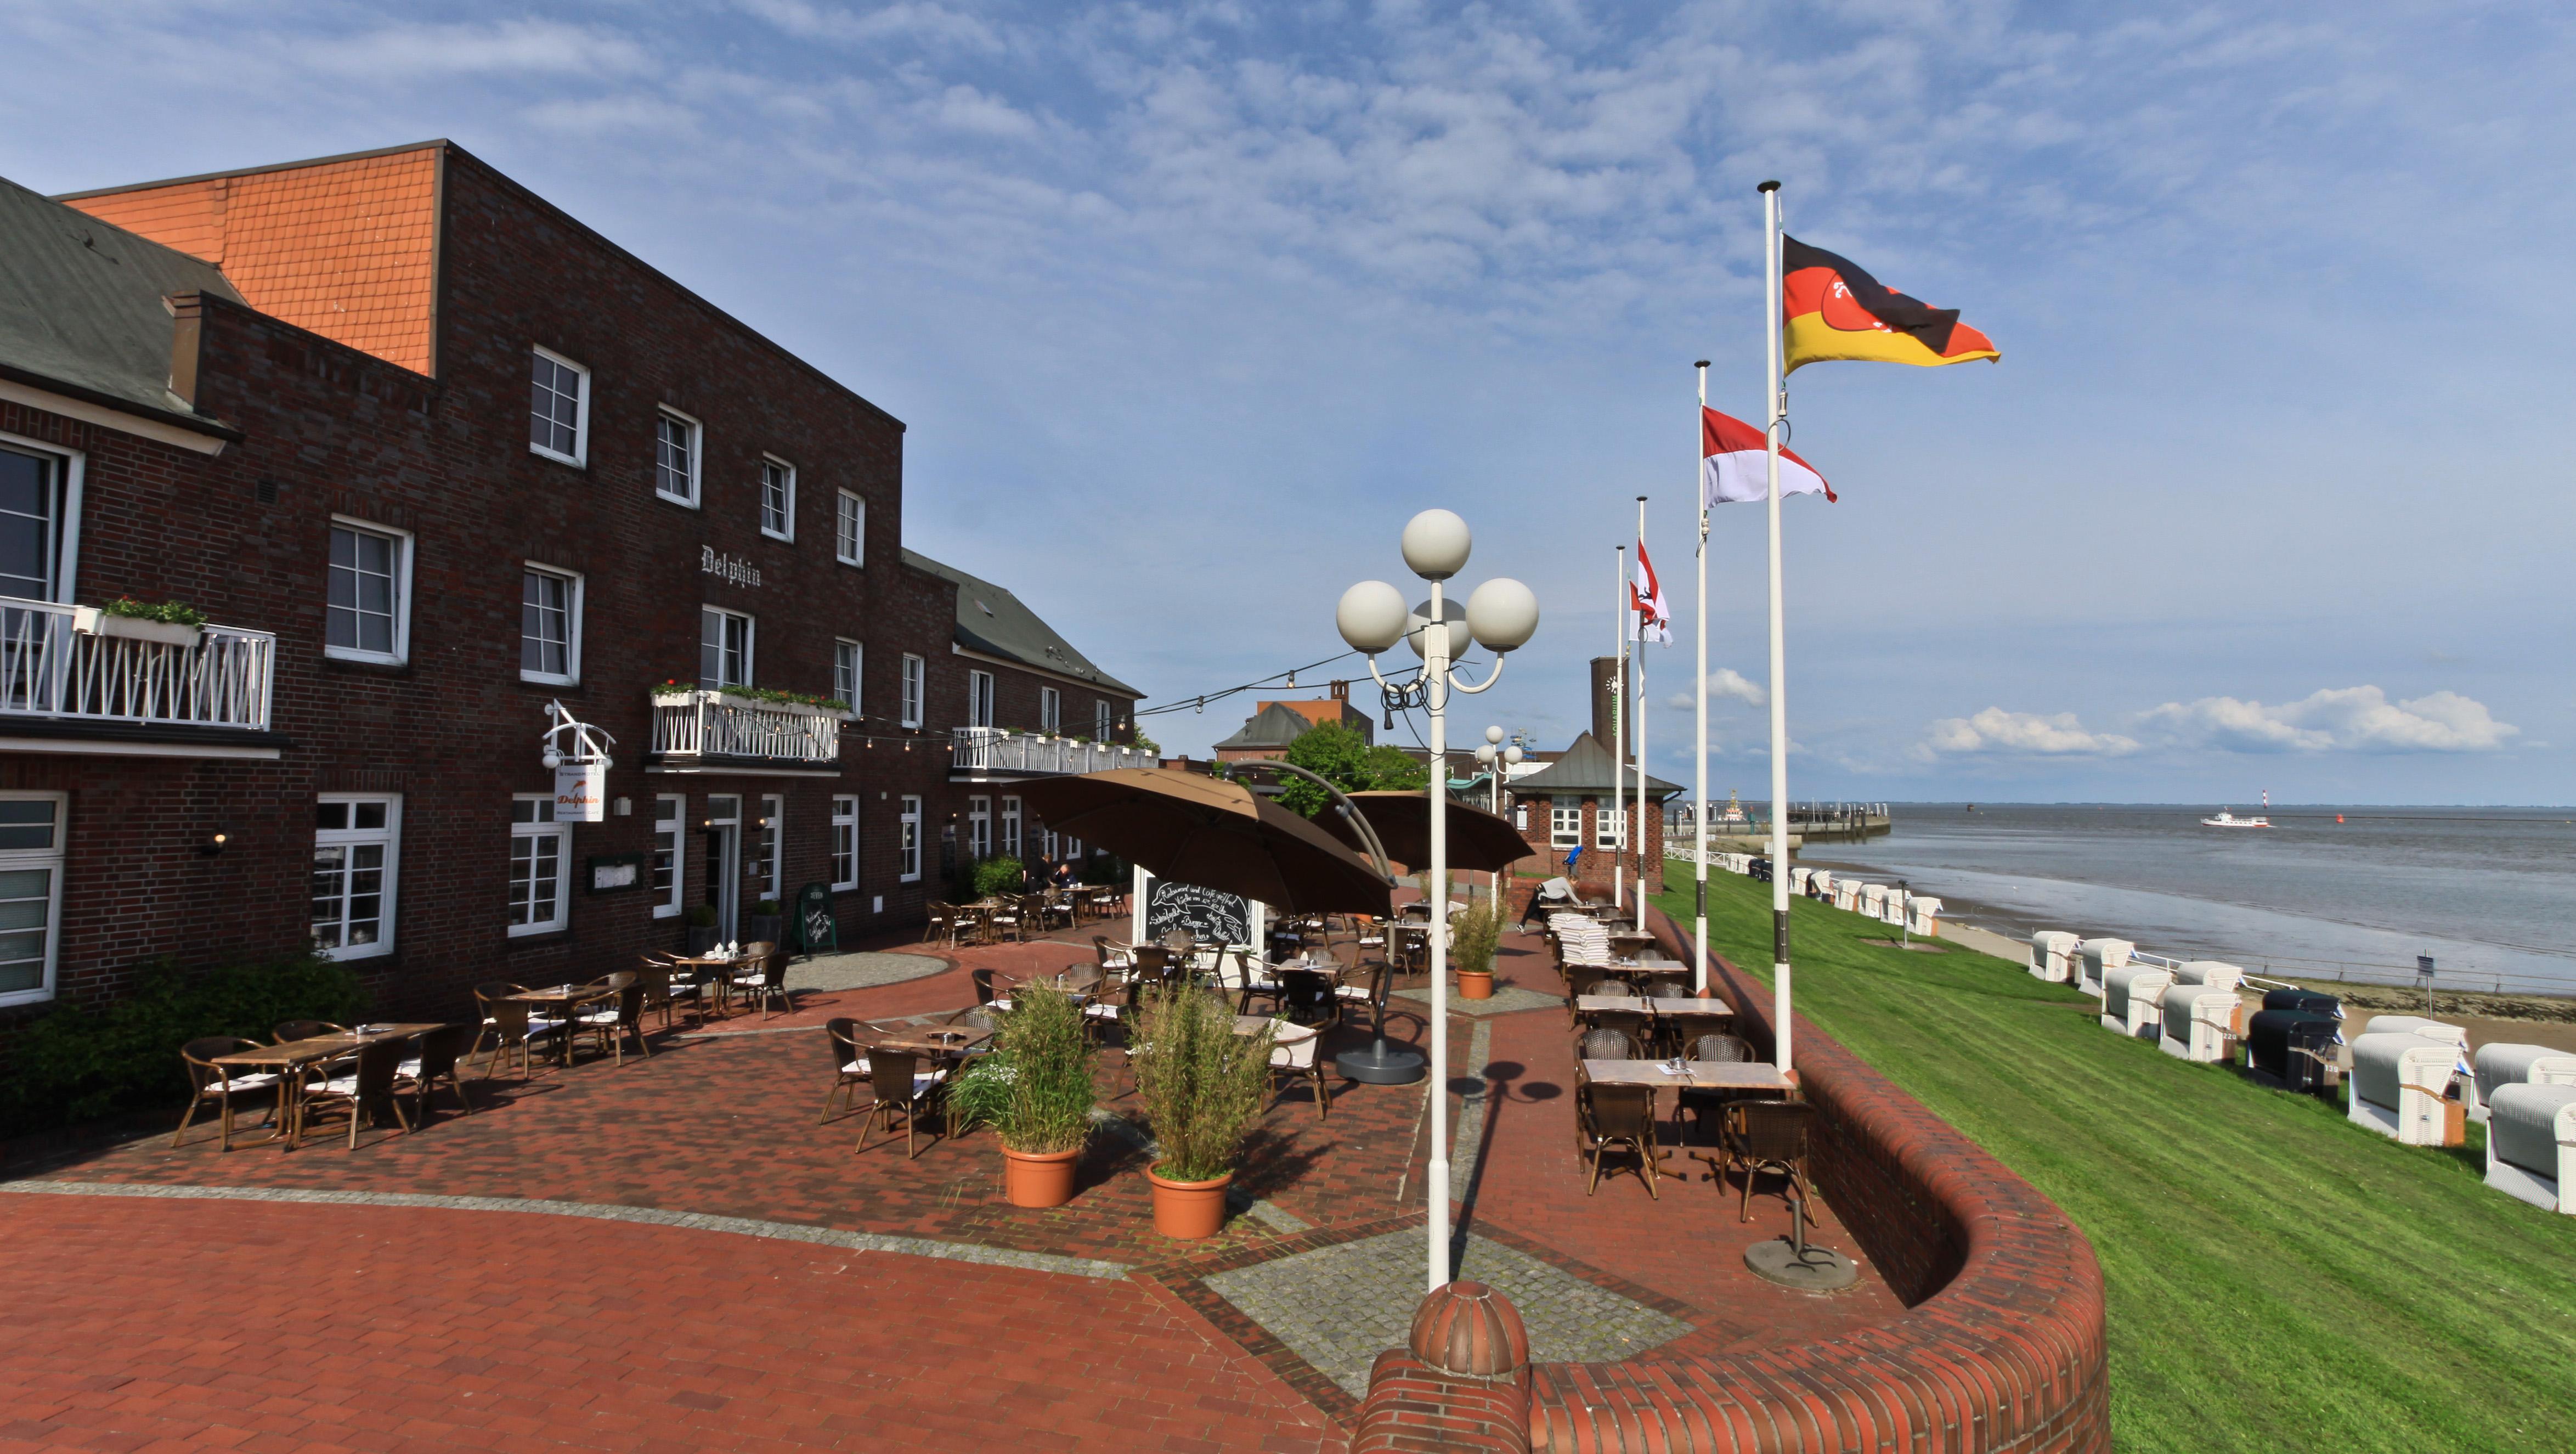 Akzent Strandhotels Seestern Amp Delphin Willkommen